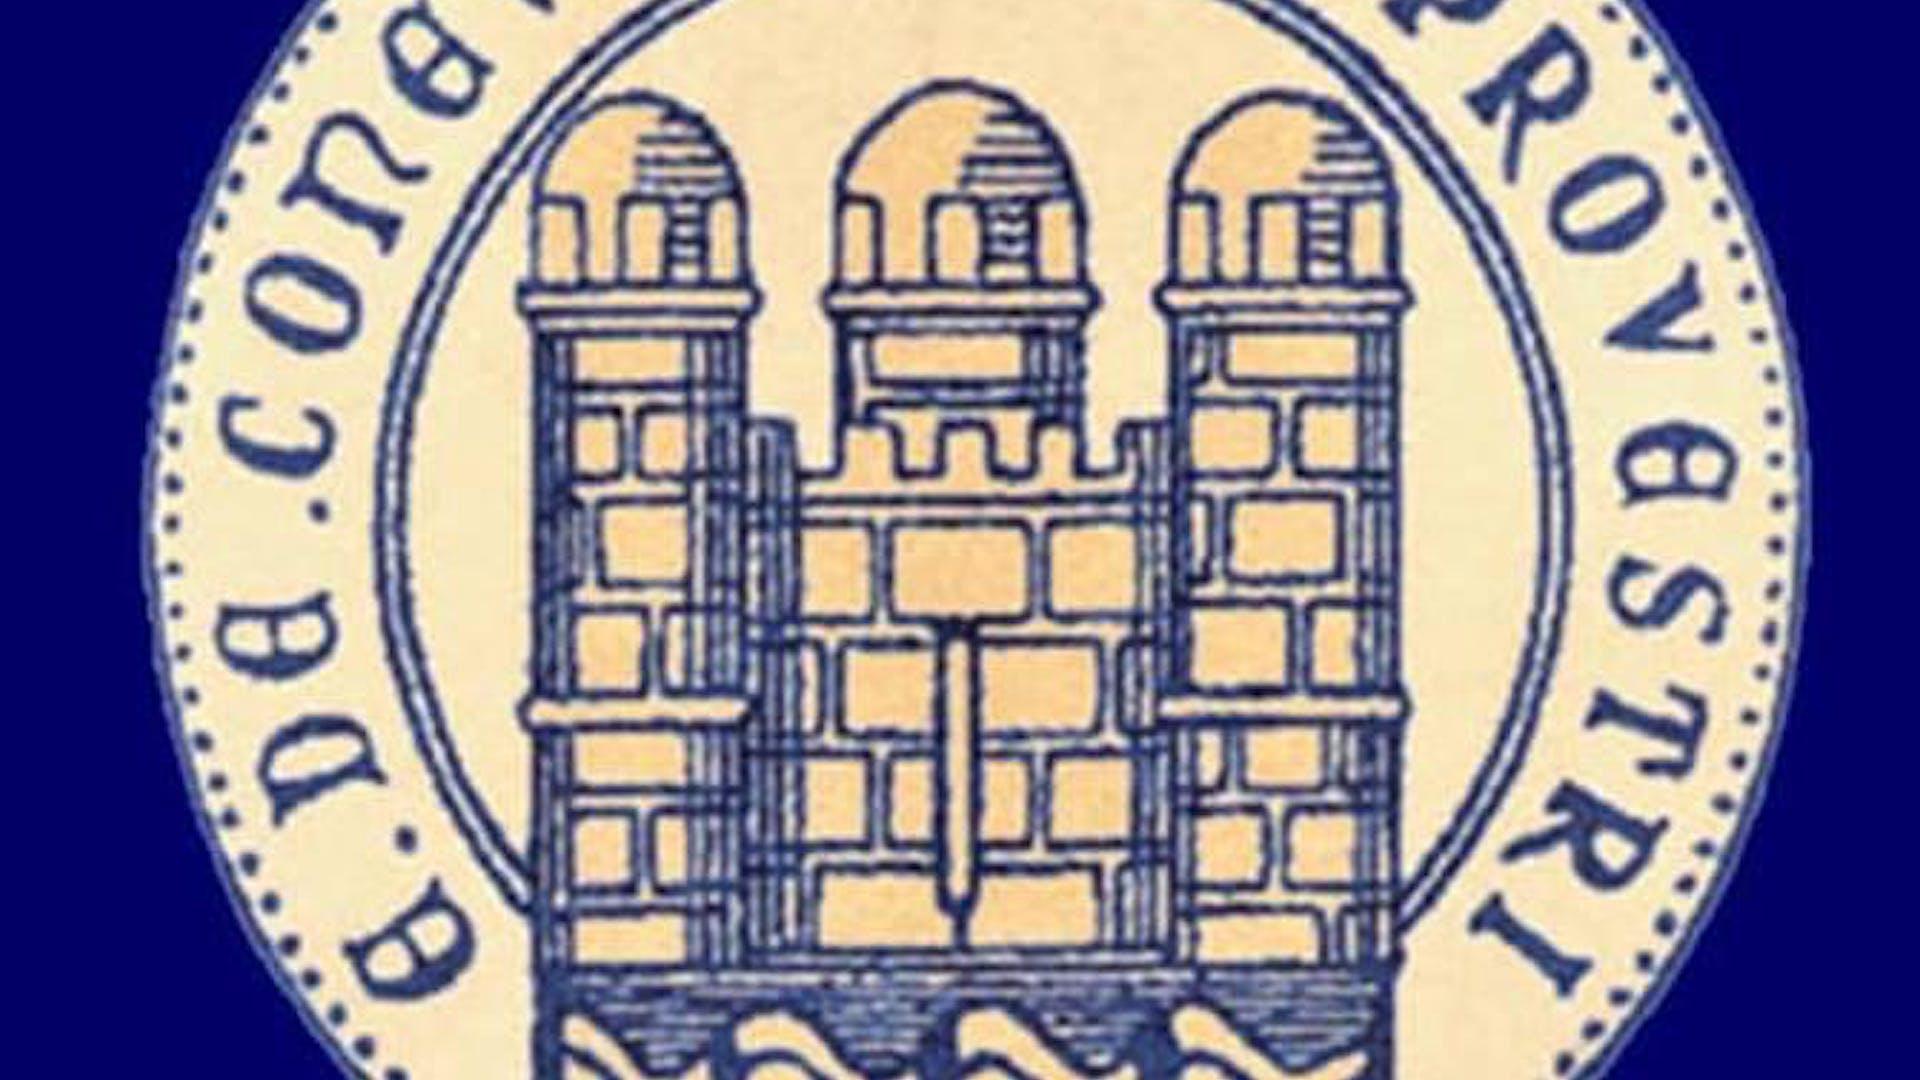 Conwy Badge